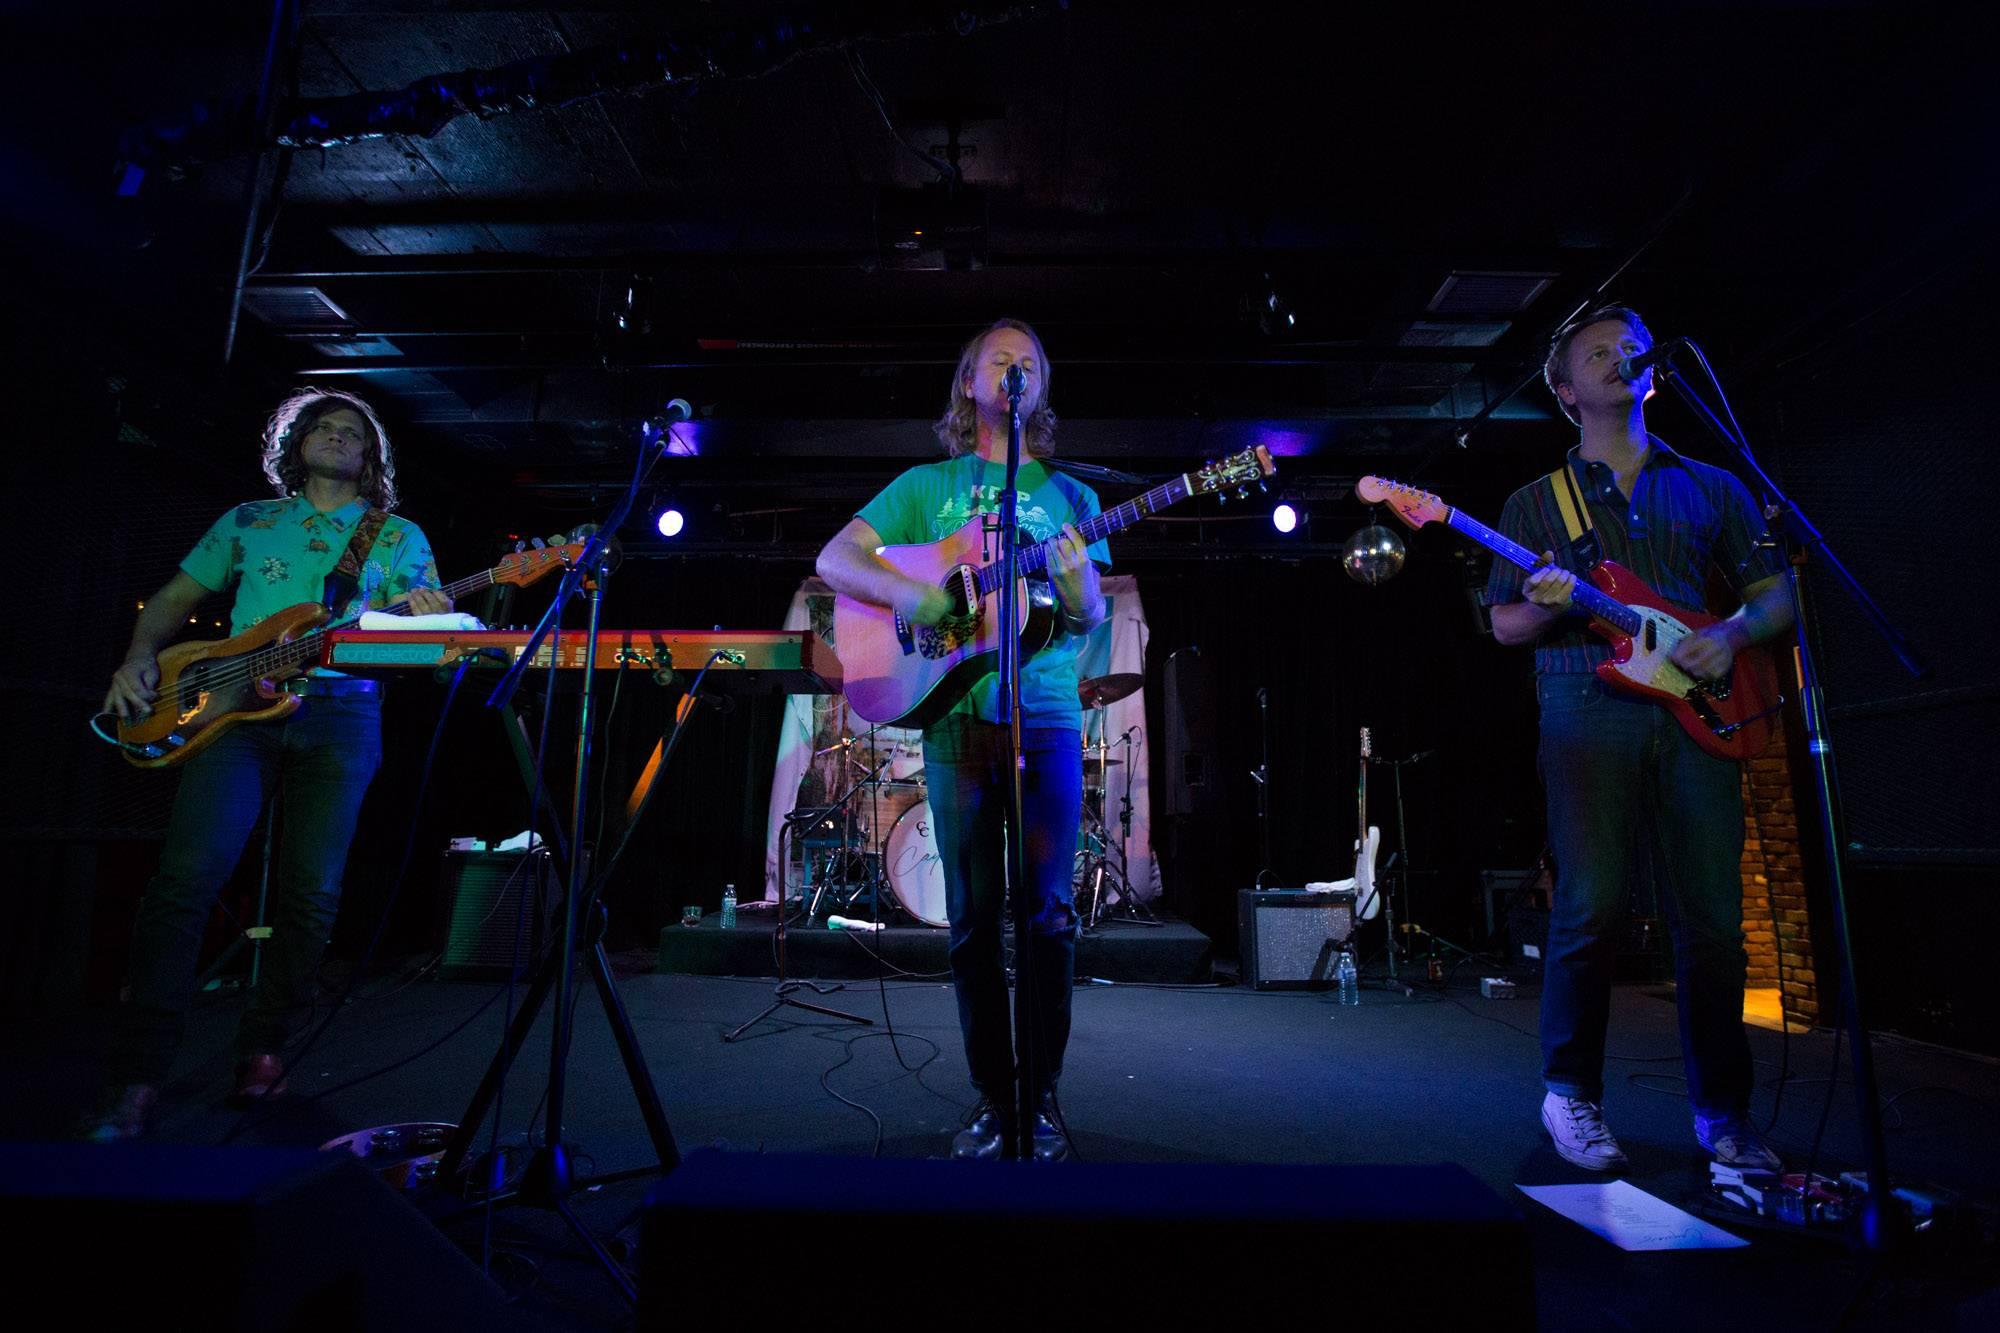 Cayucas at the Biltmore Cabaret, Vancouver, Aug 20 2015. Kirk Chantraine photo.